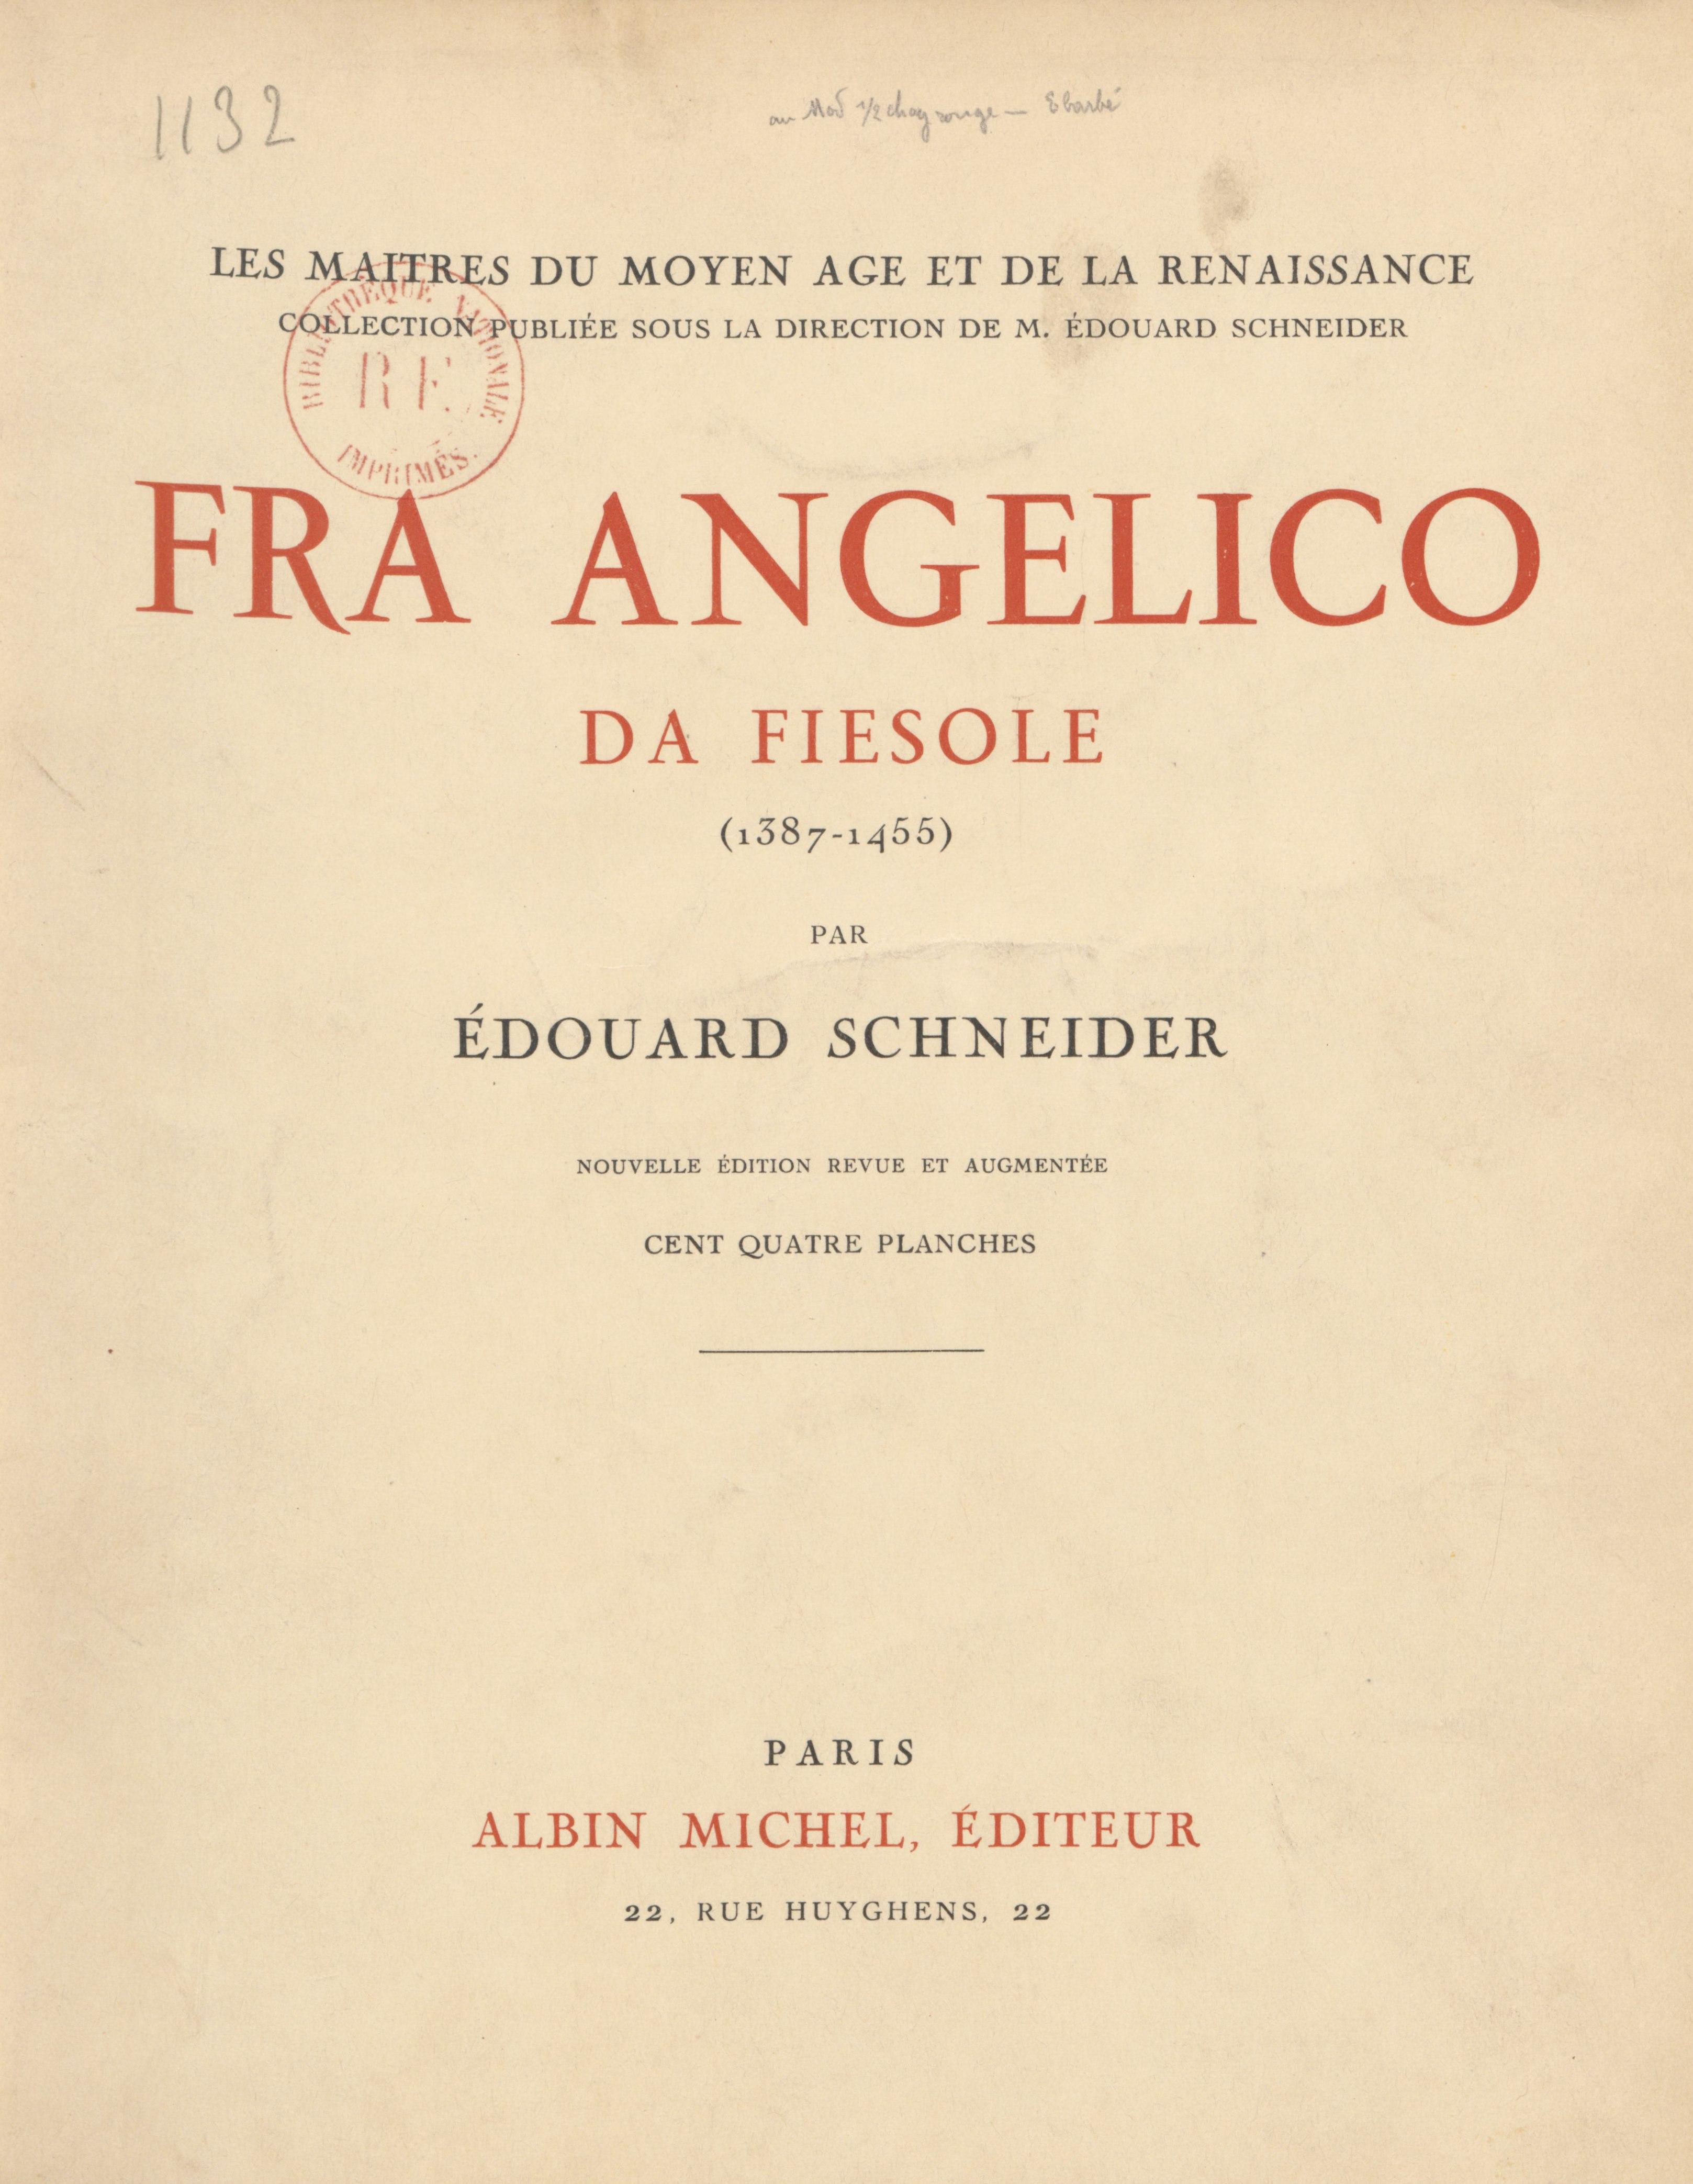 Fra Angelico da Fiesole (1387-1455)